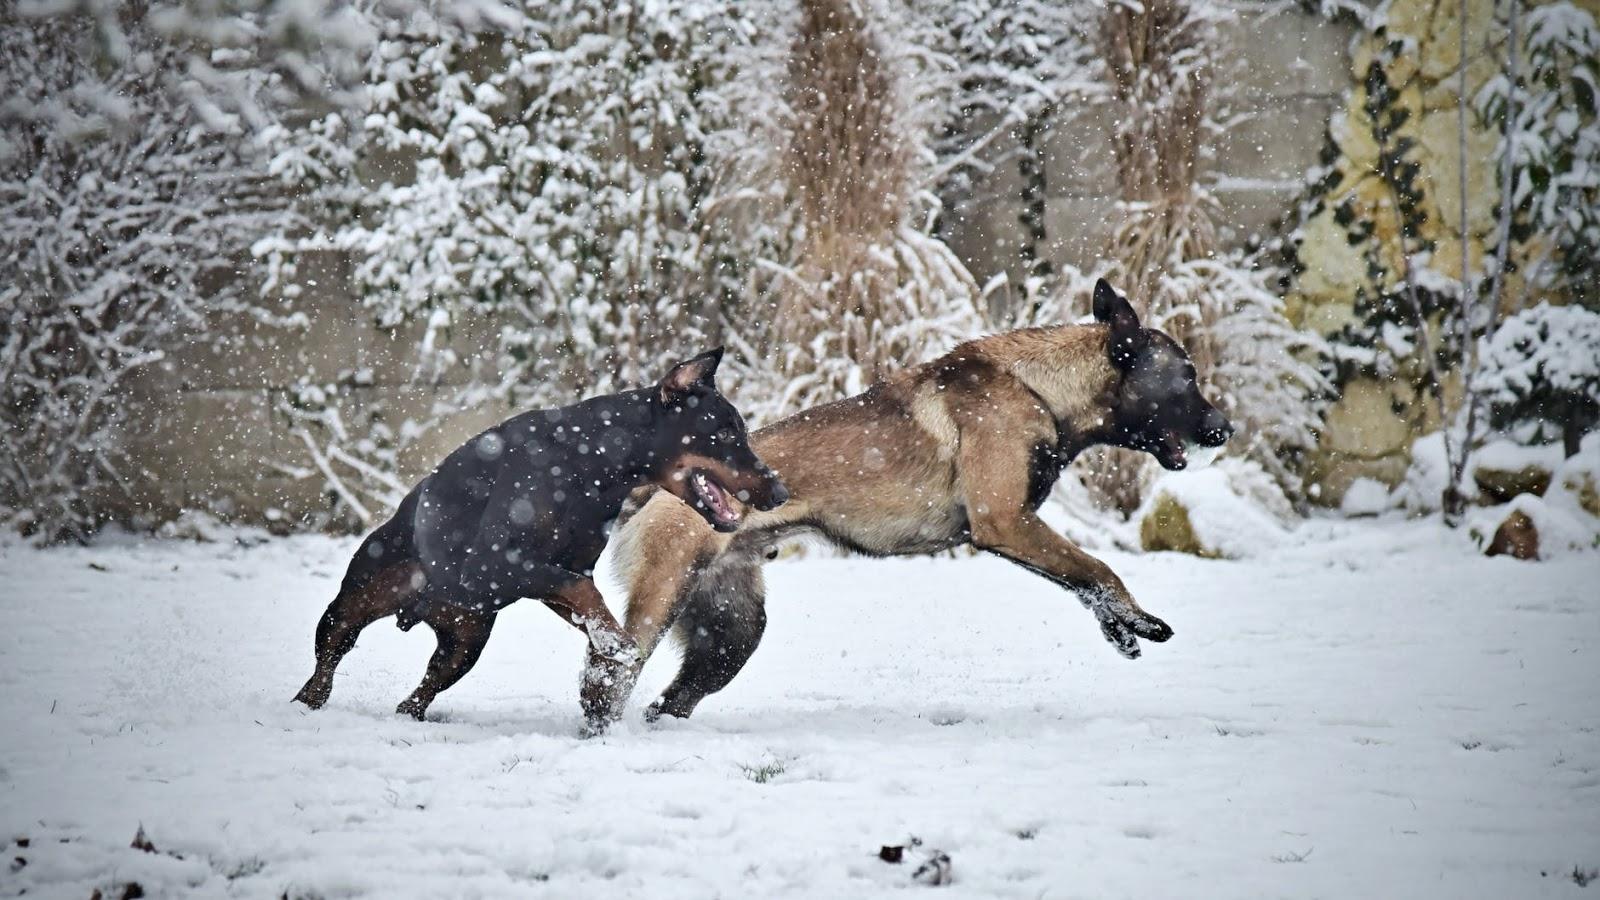 Anjing Belgian Malinois Ras Pelindung Penuh Energi Untuk Pemilik Berpengalaman